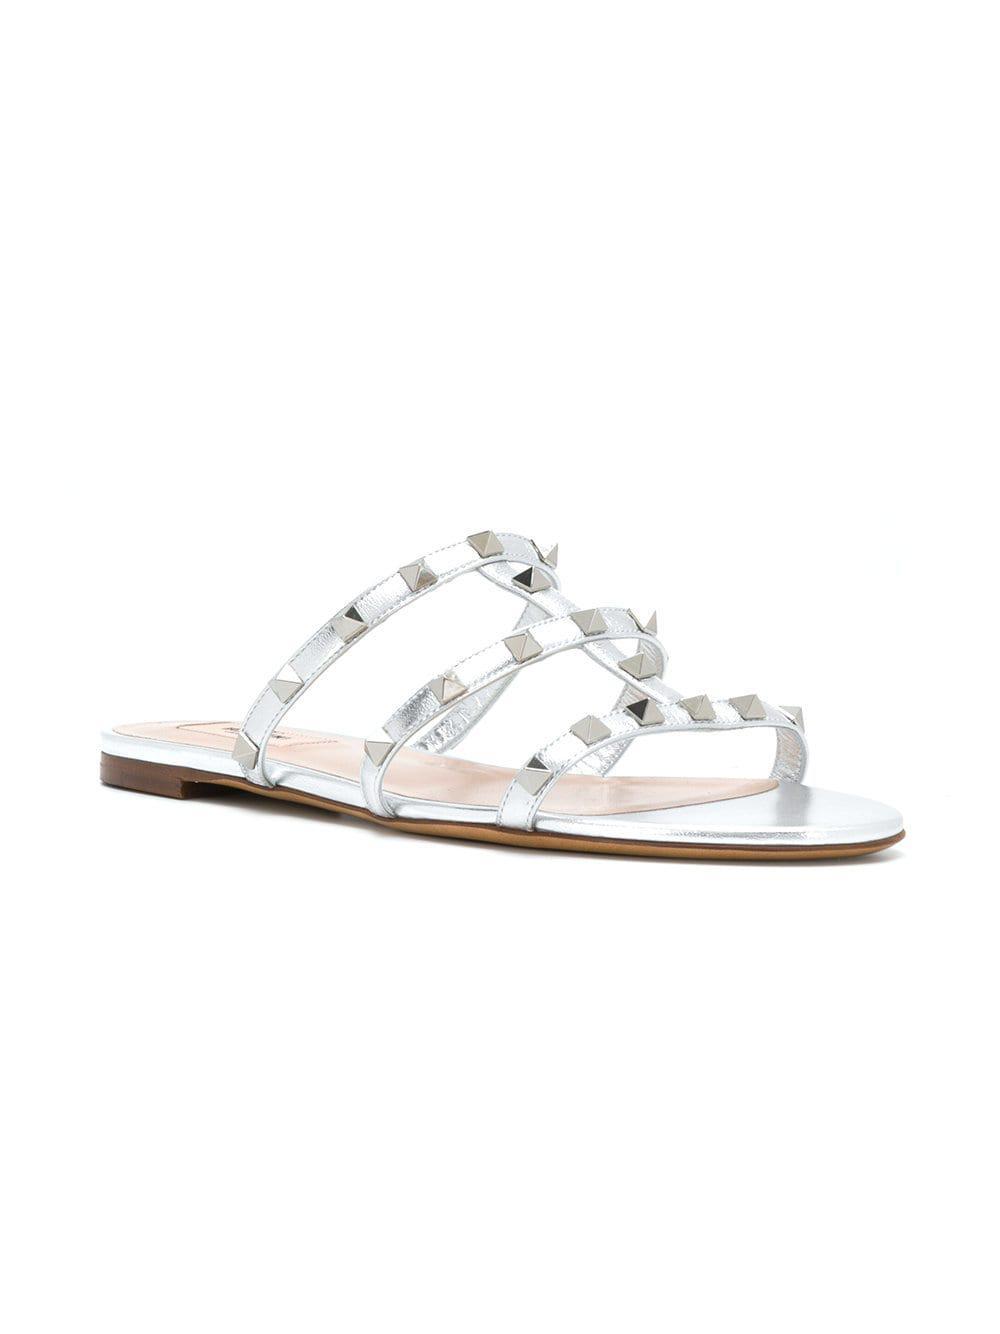 e88ae3b2b Valentino Rockstud Leather Sandals in Metallic - Lyst